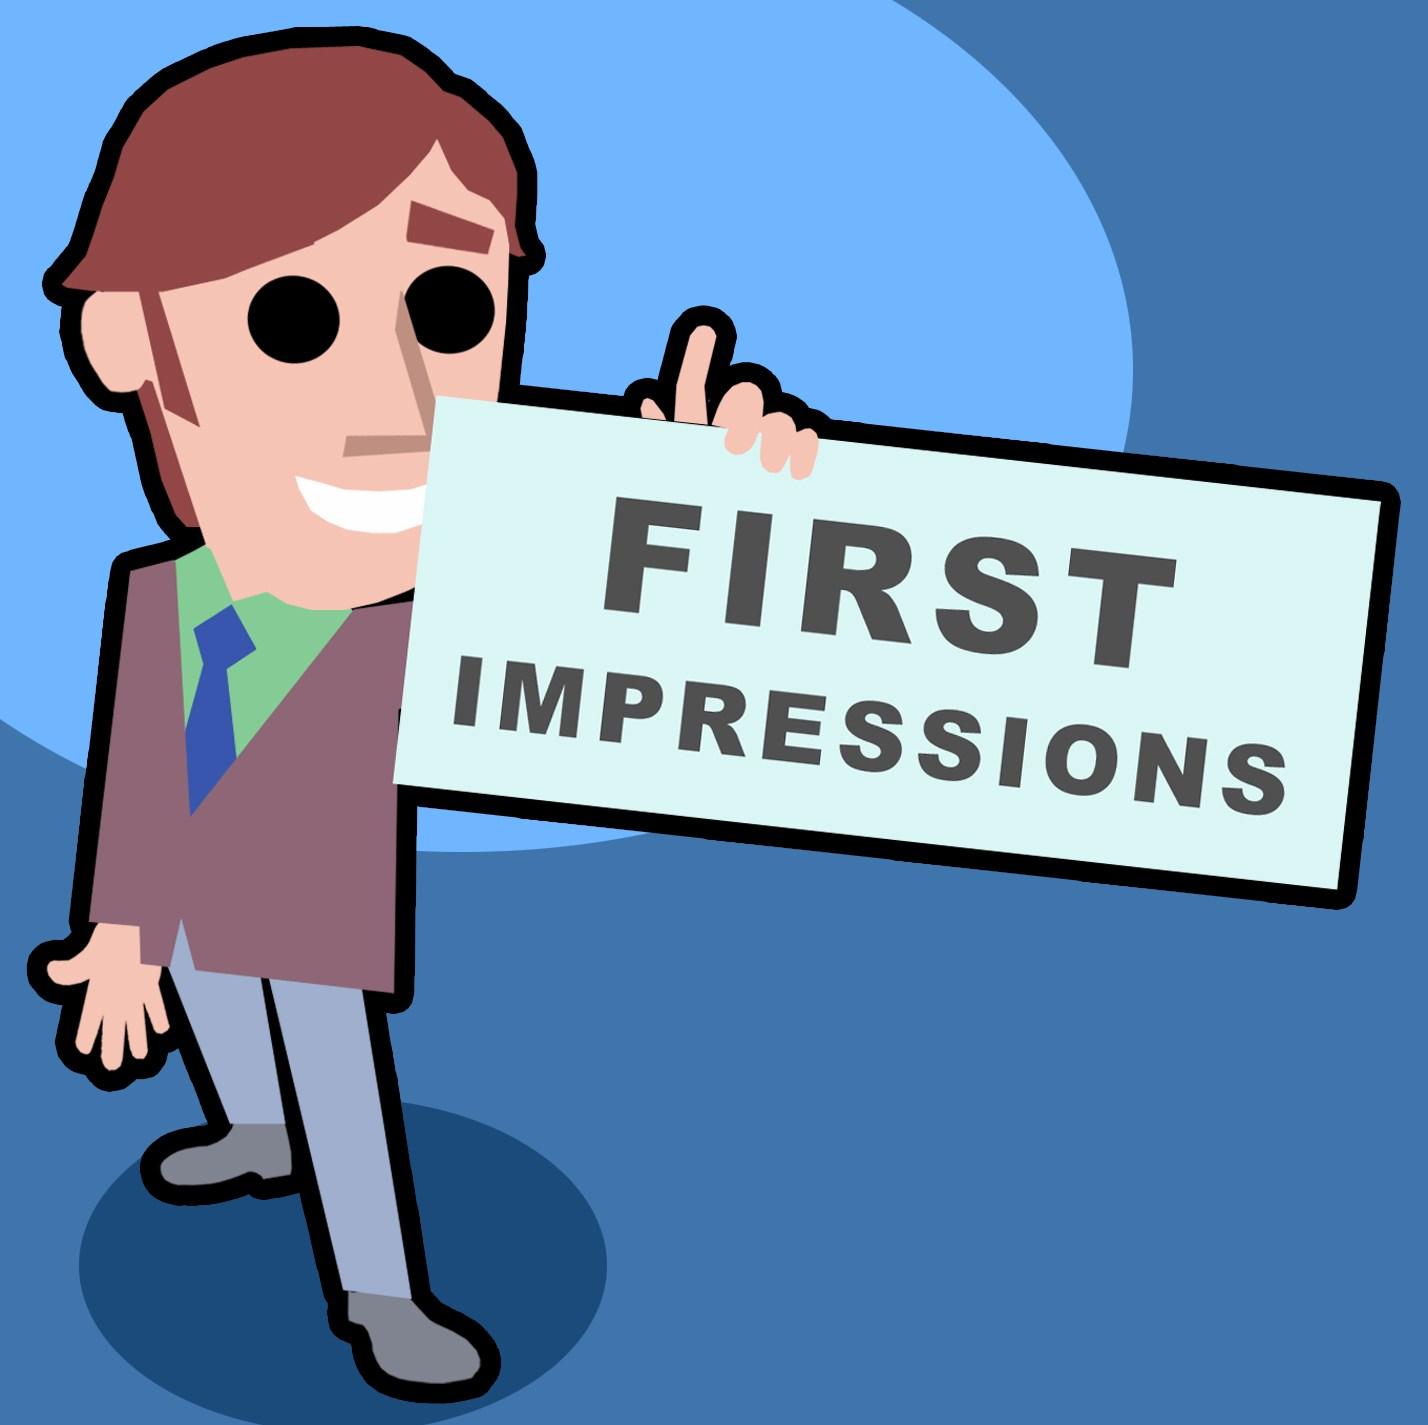 First impressions clipart 4 » Clipart Portal.